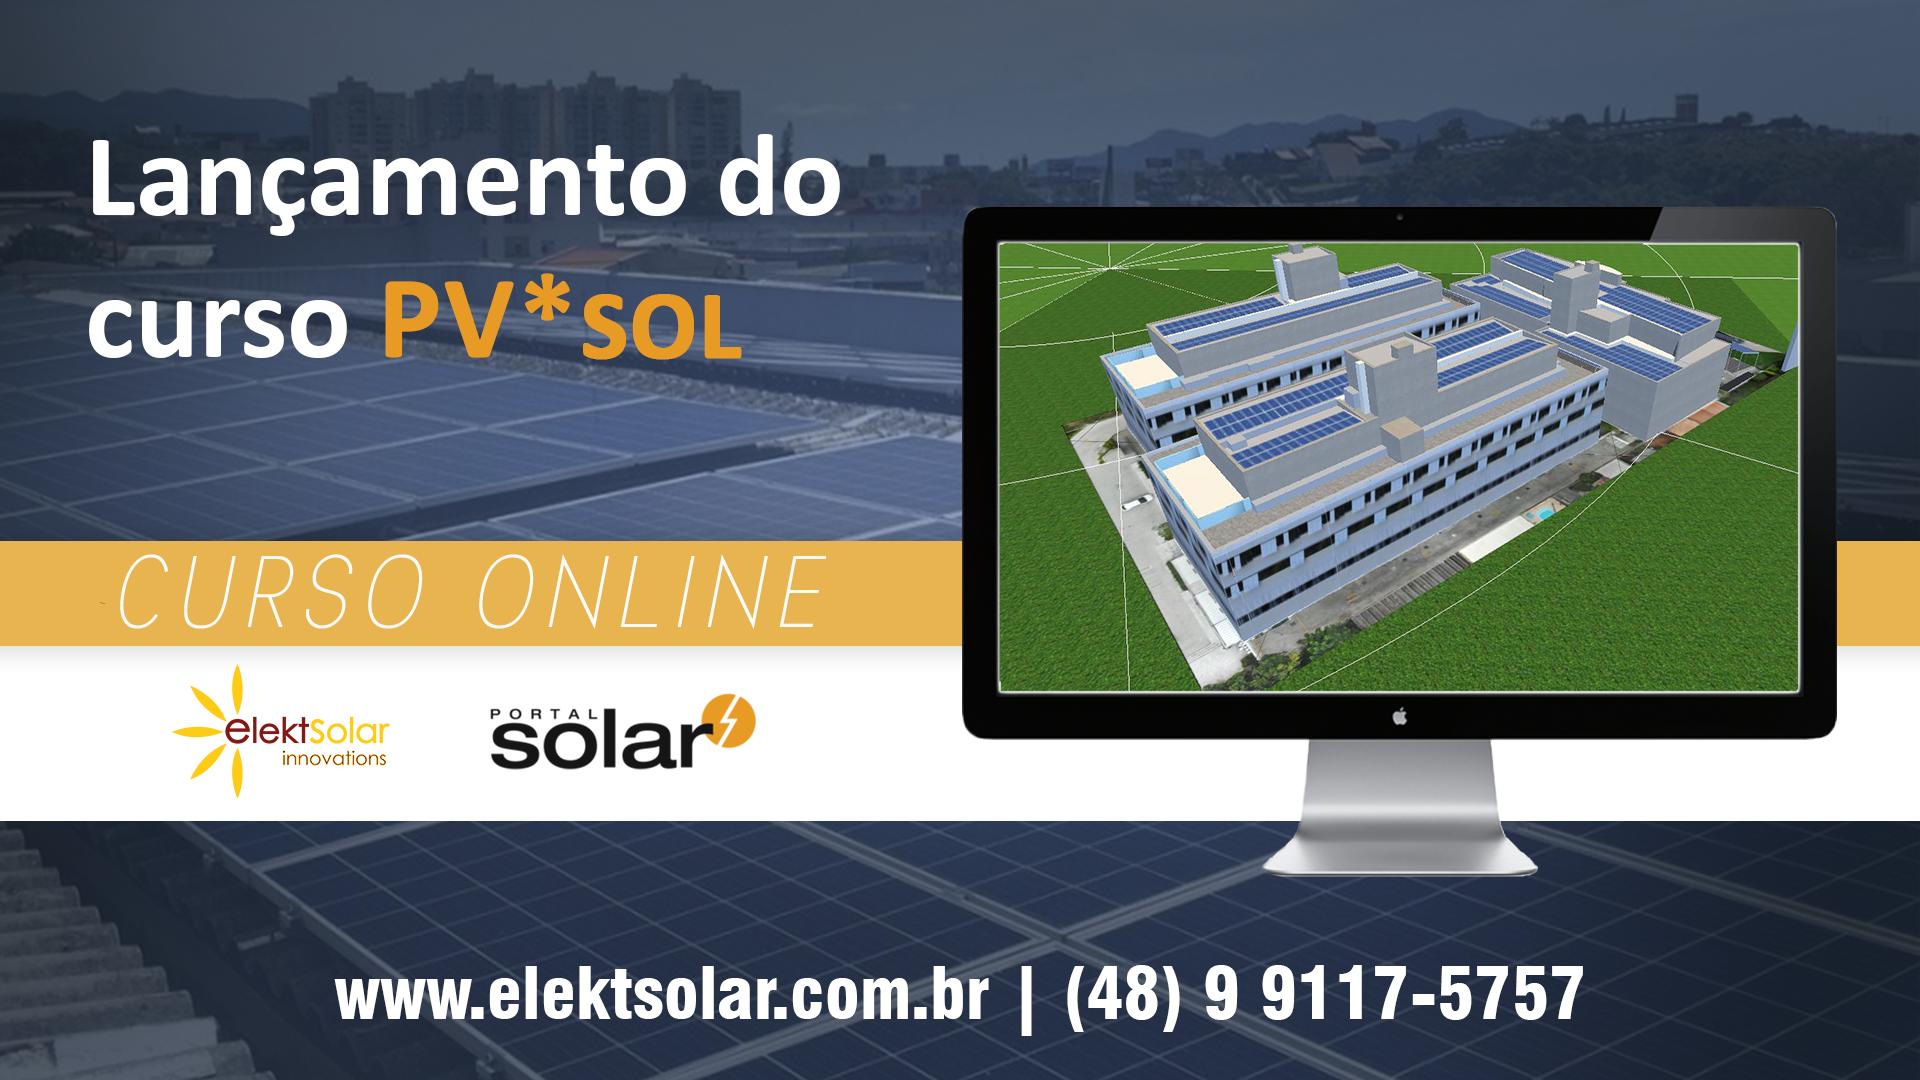 pv sol online